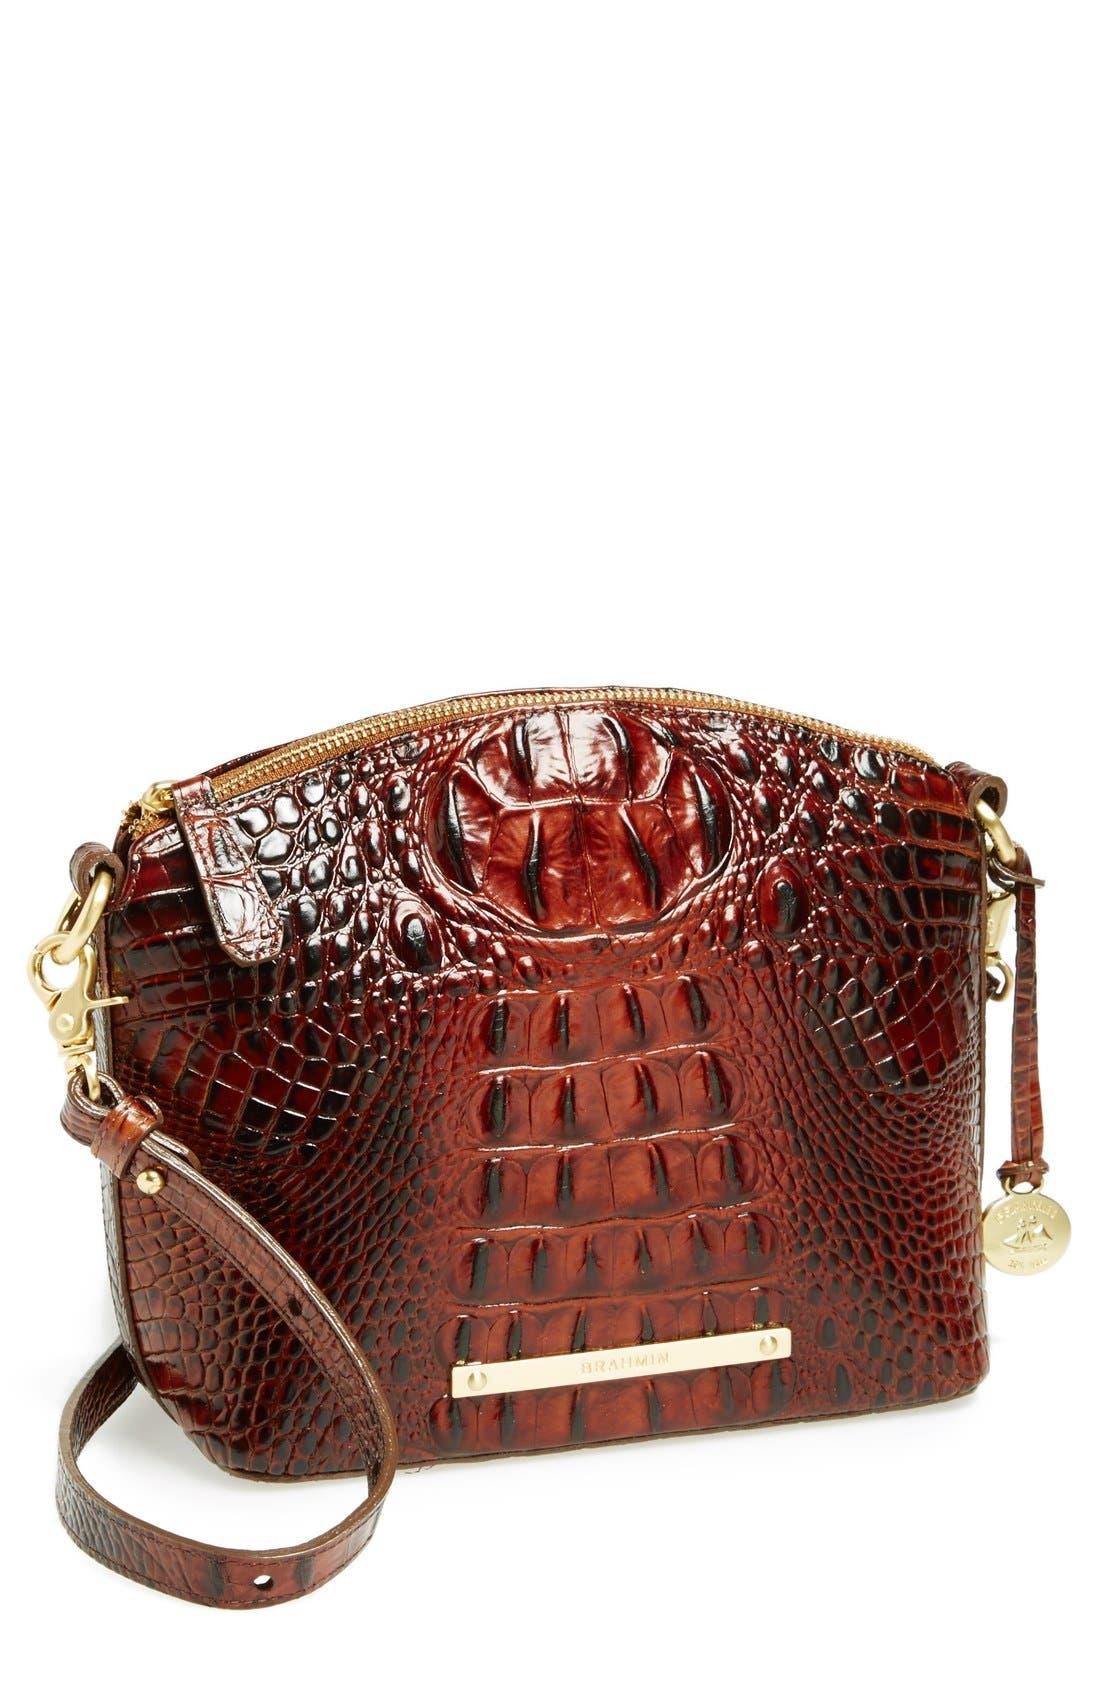 Alternate Image 1 Selected - Brahmin 'Mini Duxbury' Crossbody Bag